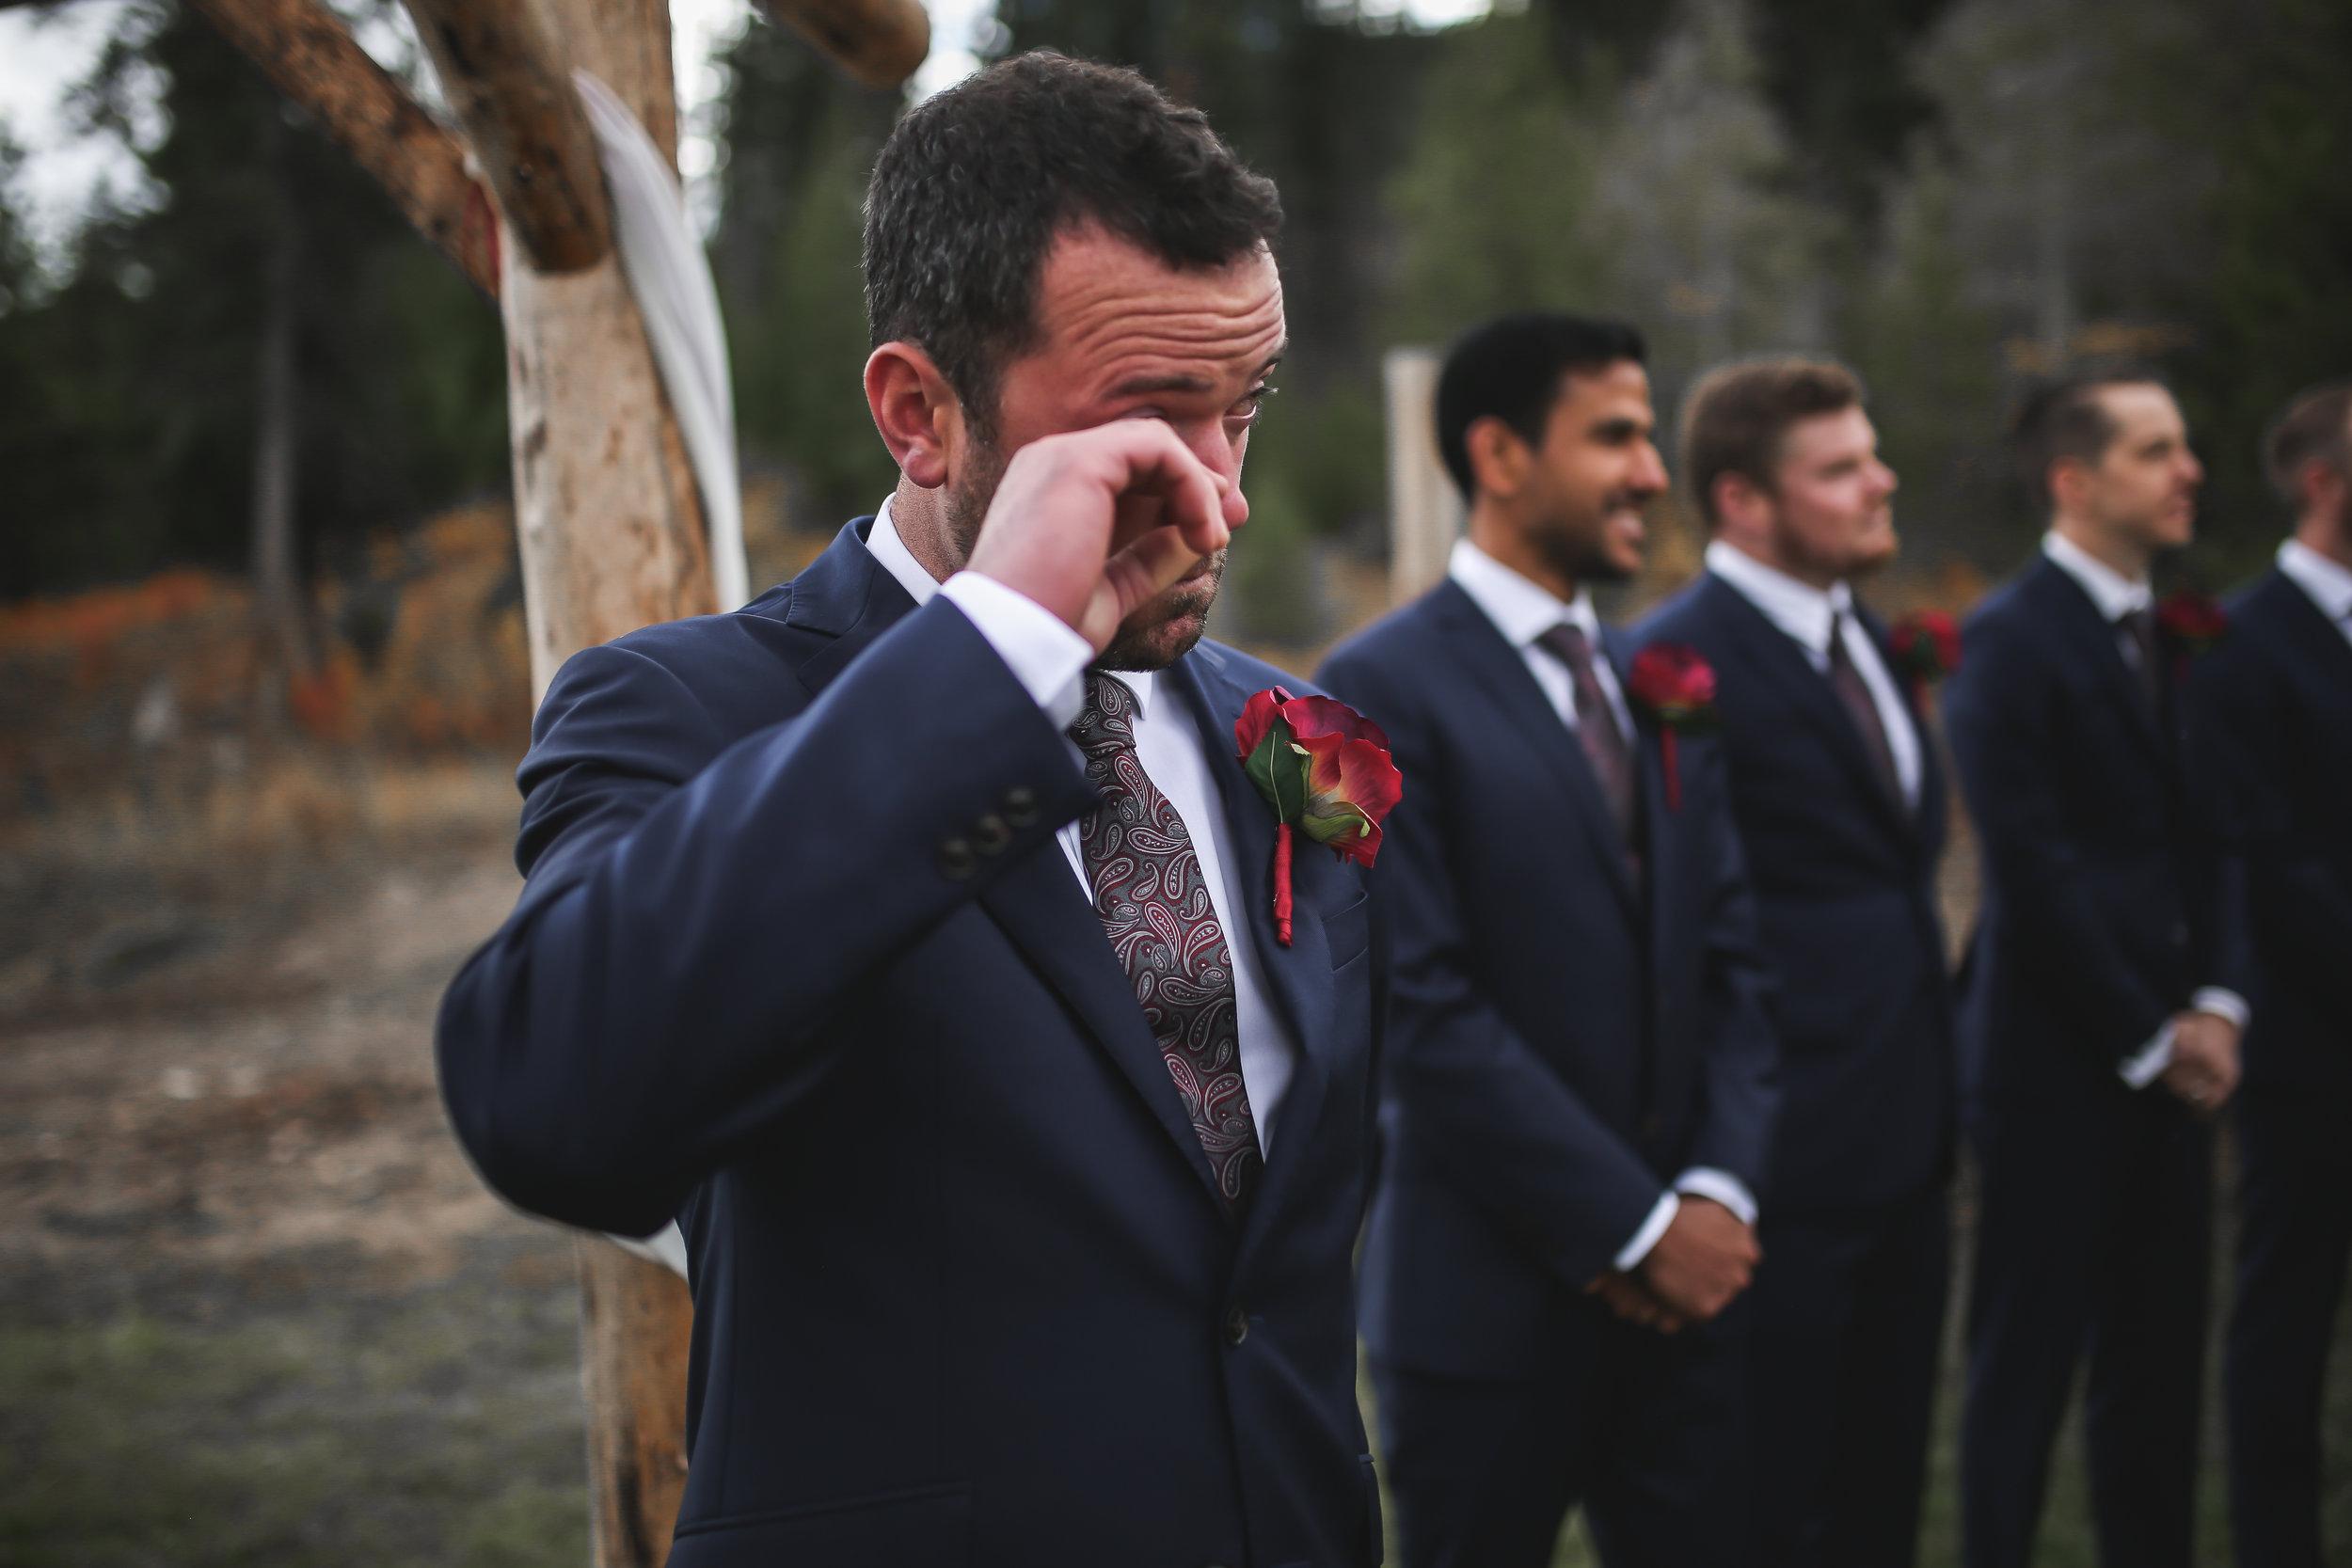 133 Adam Ziorio Photography - Vitoria wedding photographer Nick&Bree Fernie Wedding.jpg